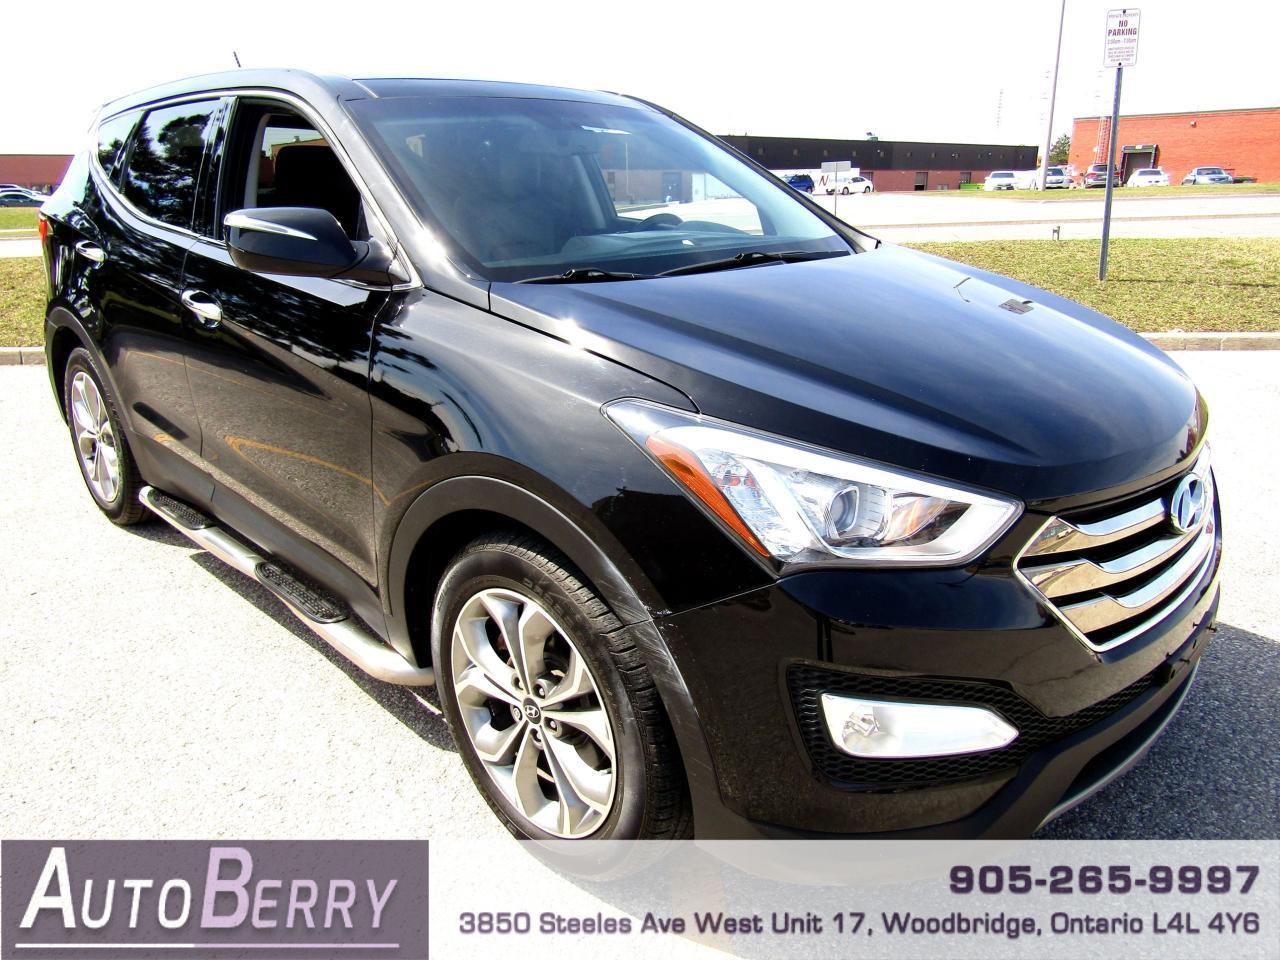 2013 Hyundai Santa Fe 2.0T - Sport - Premium AWD